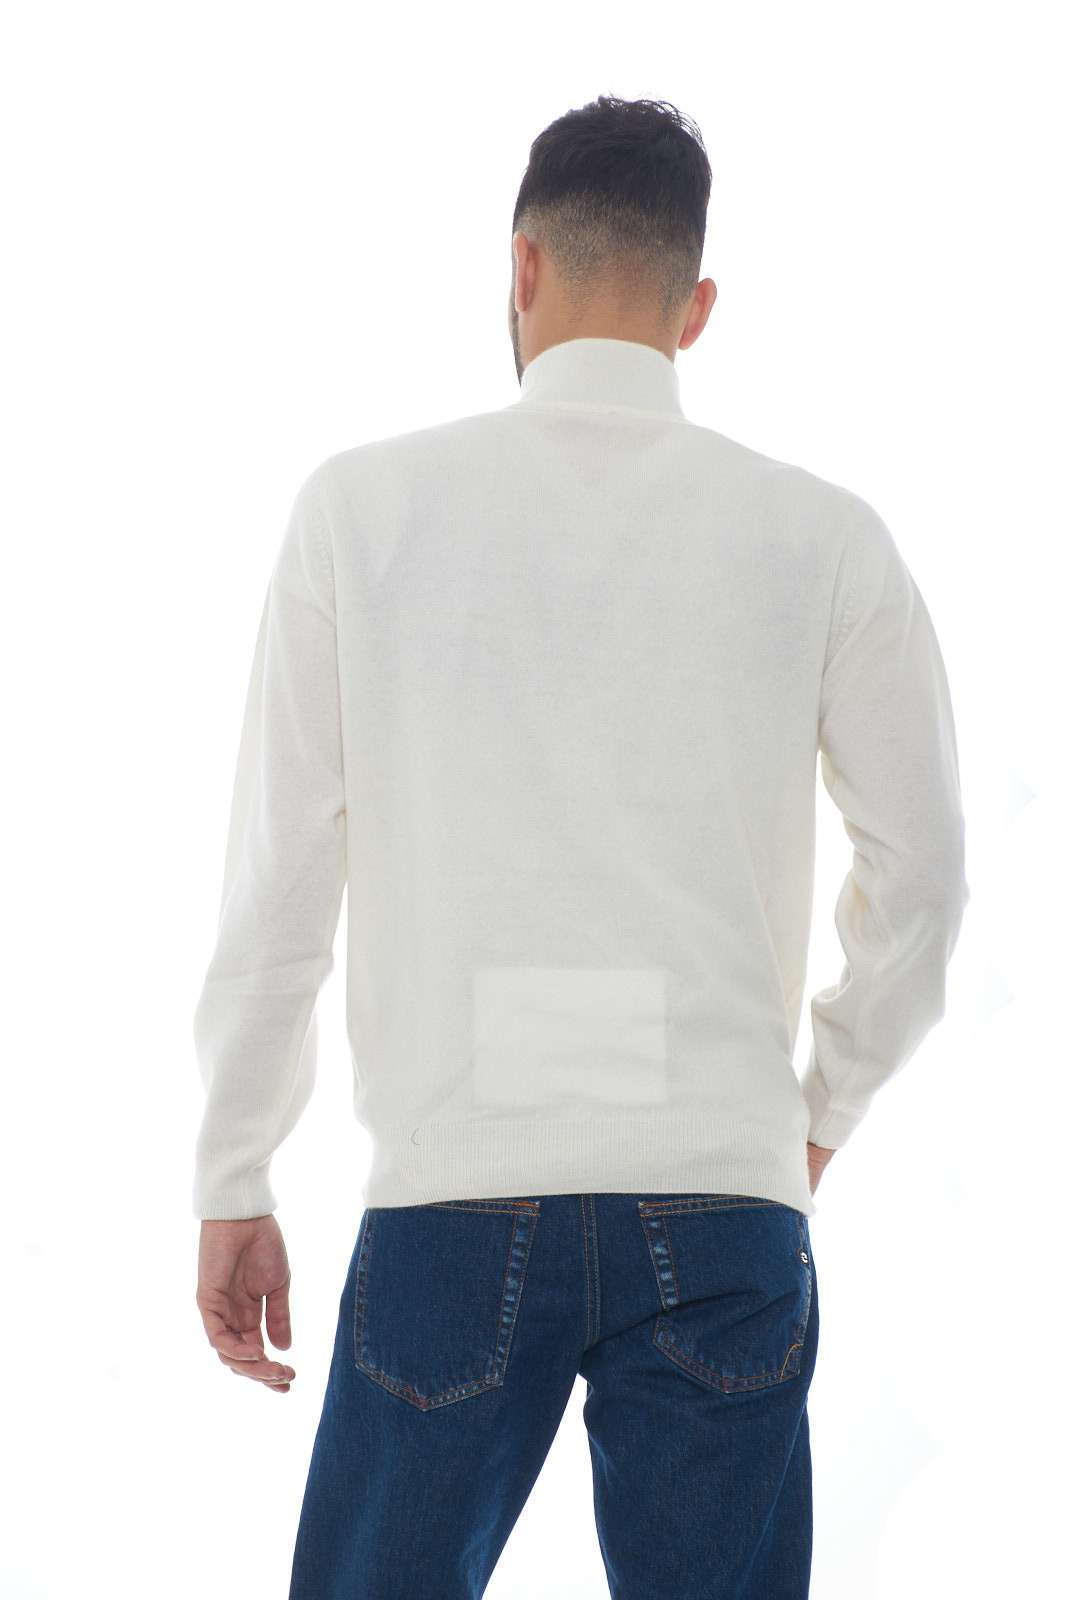 https://www.parmax.com/media/catalog/product/a/i/AI-outlet_parmax-maglia-uomo-Acquapura-003-C.jpg